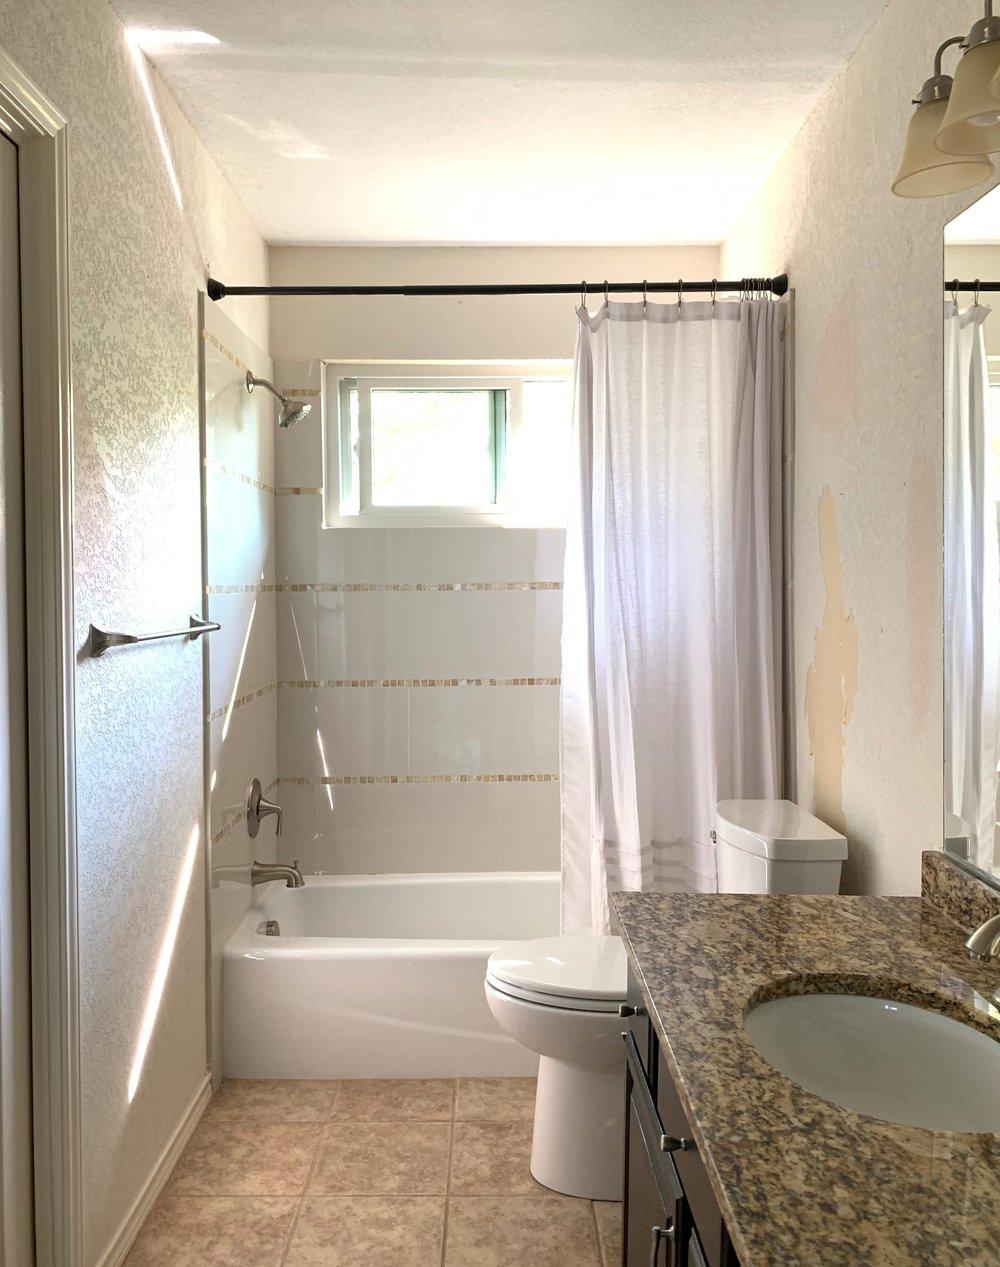 ORC bathroom before